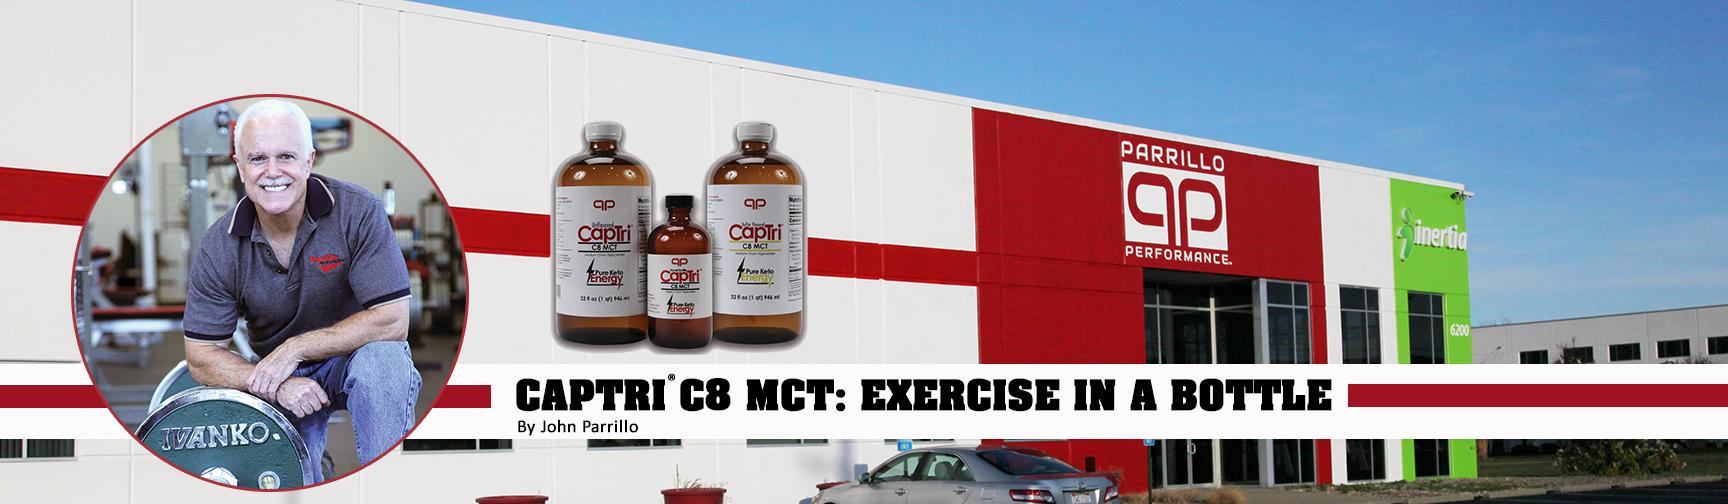 captri-c8-mct-banner